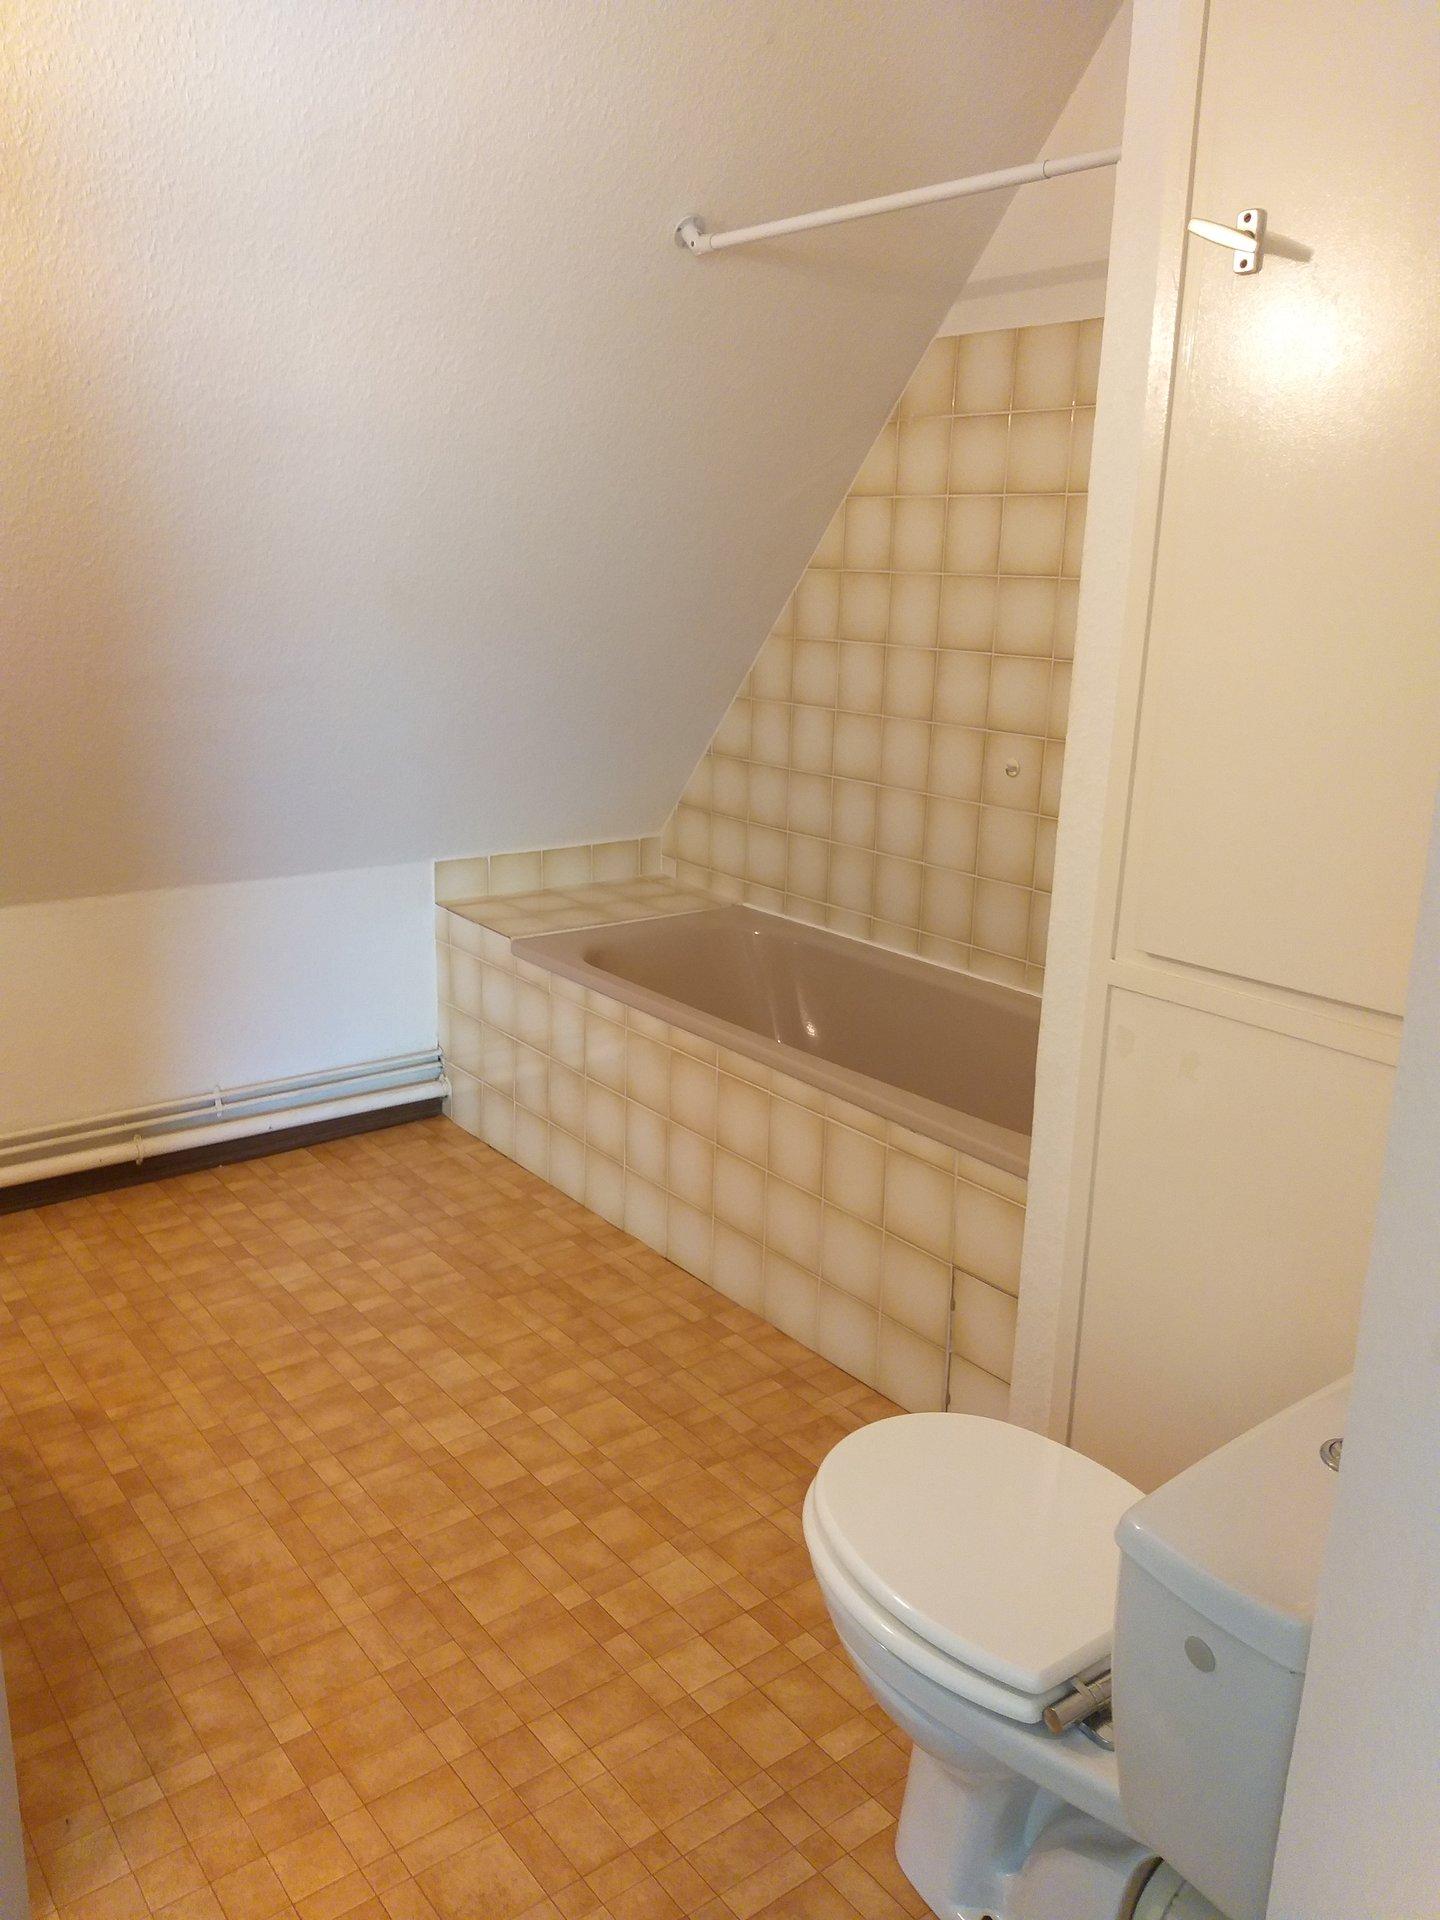 Obernai : 2 pièces dernier étage !!